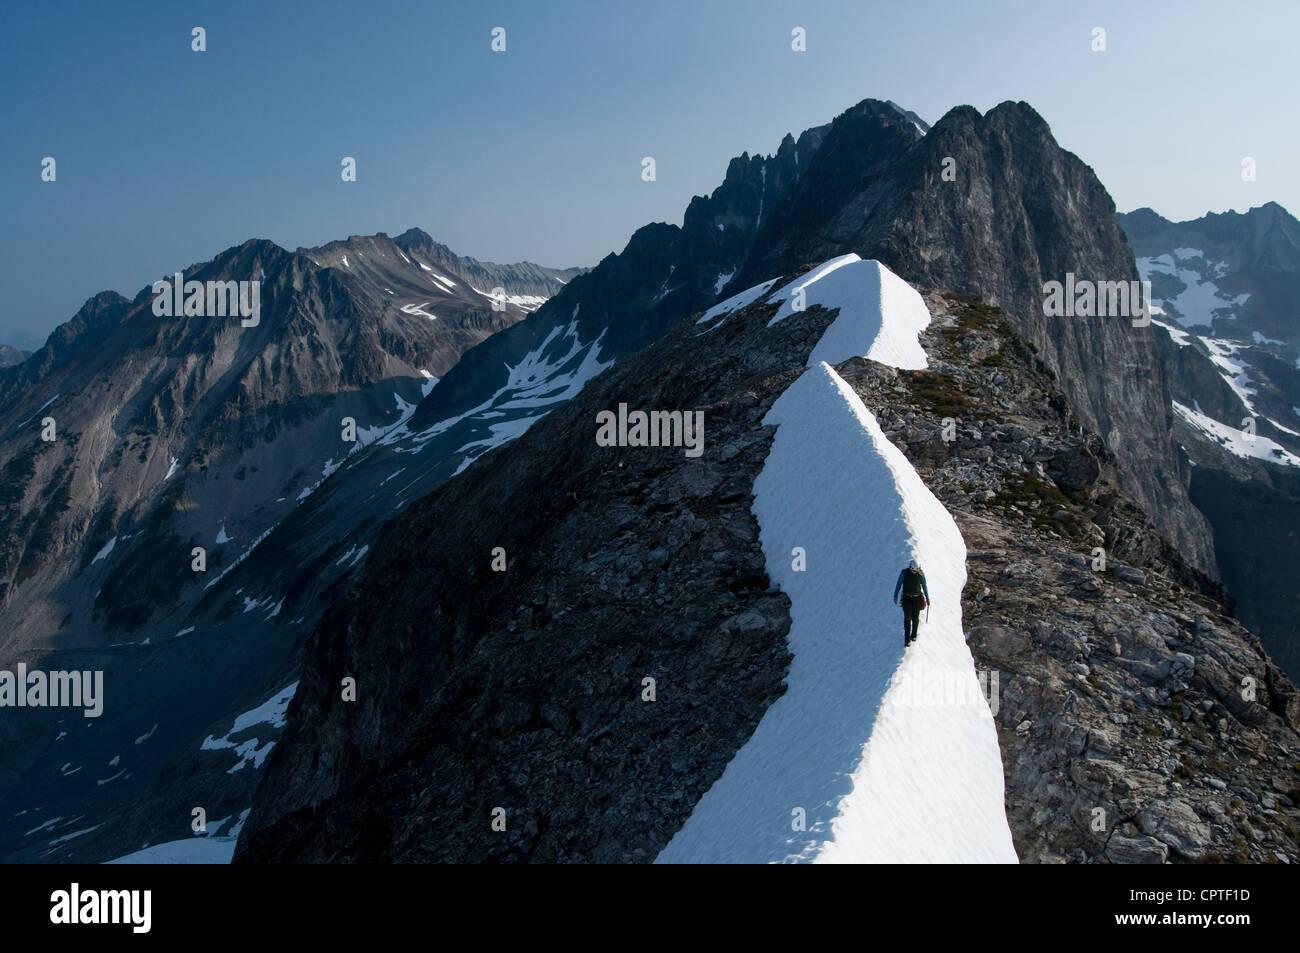 Female climber traversing snowy ridge, Redoubt Whatcom Traverse, North Cascades National Park, WA, USA - Stock Image